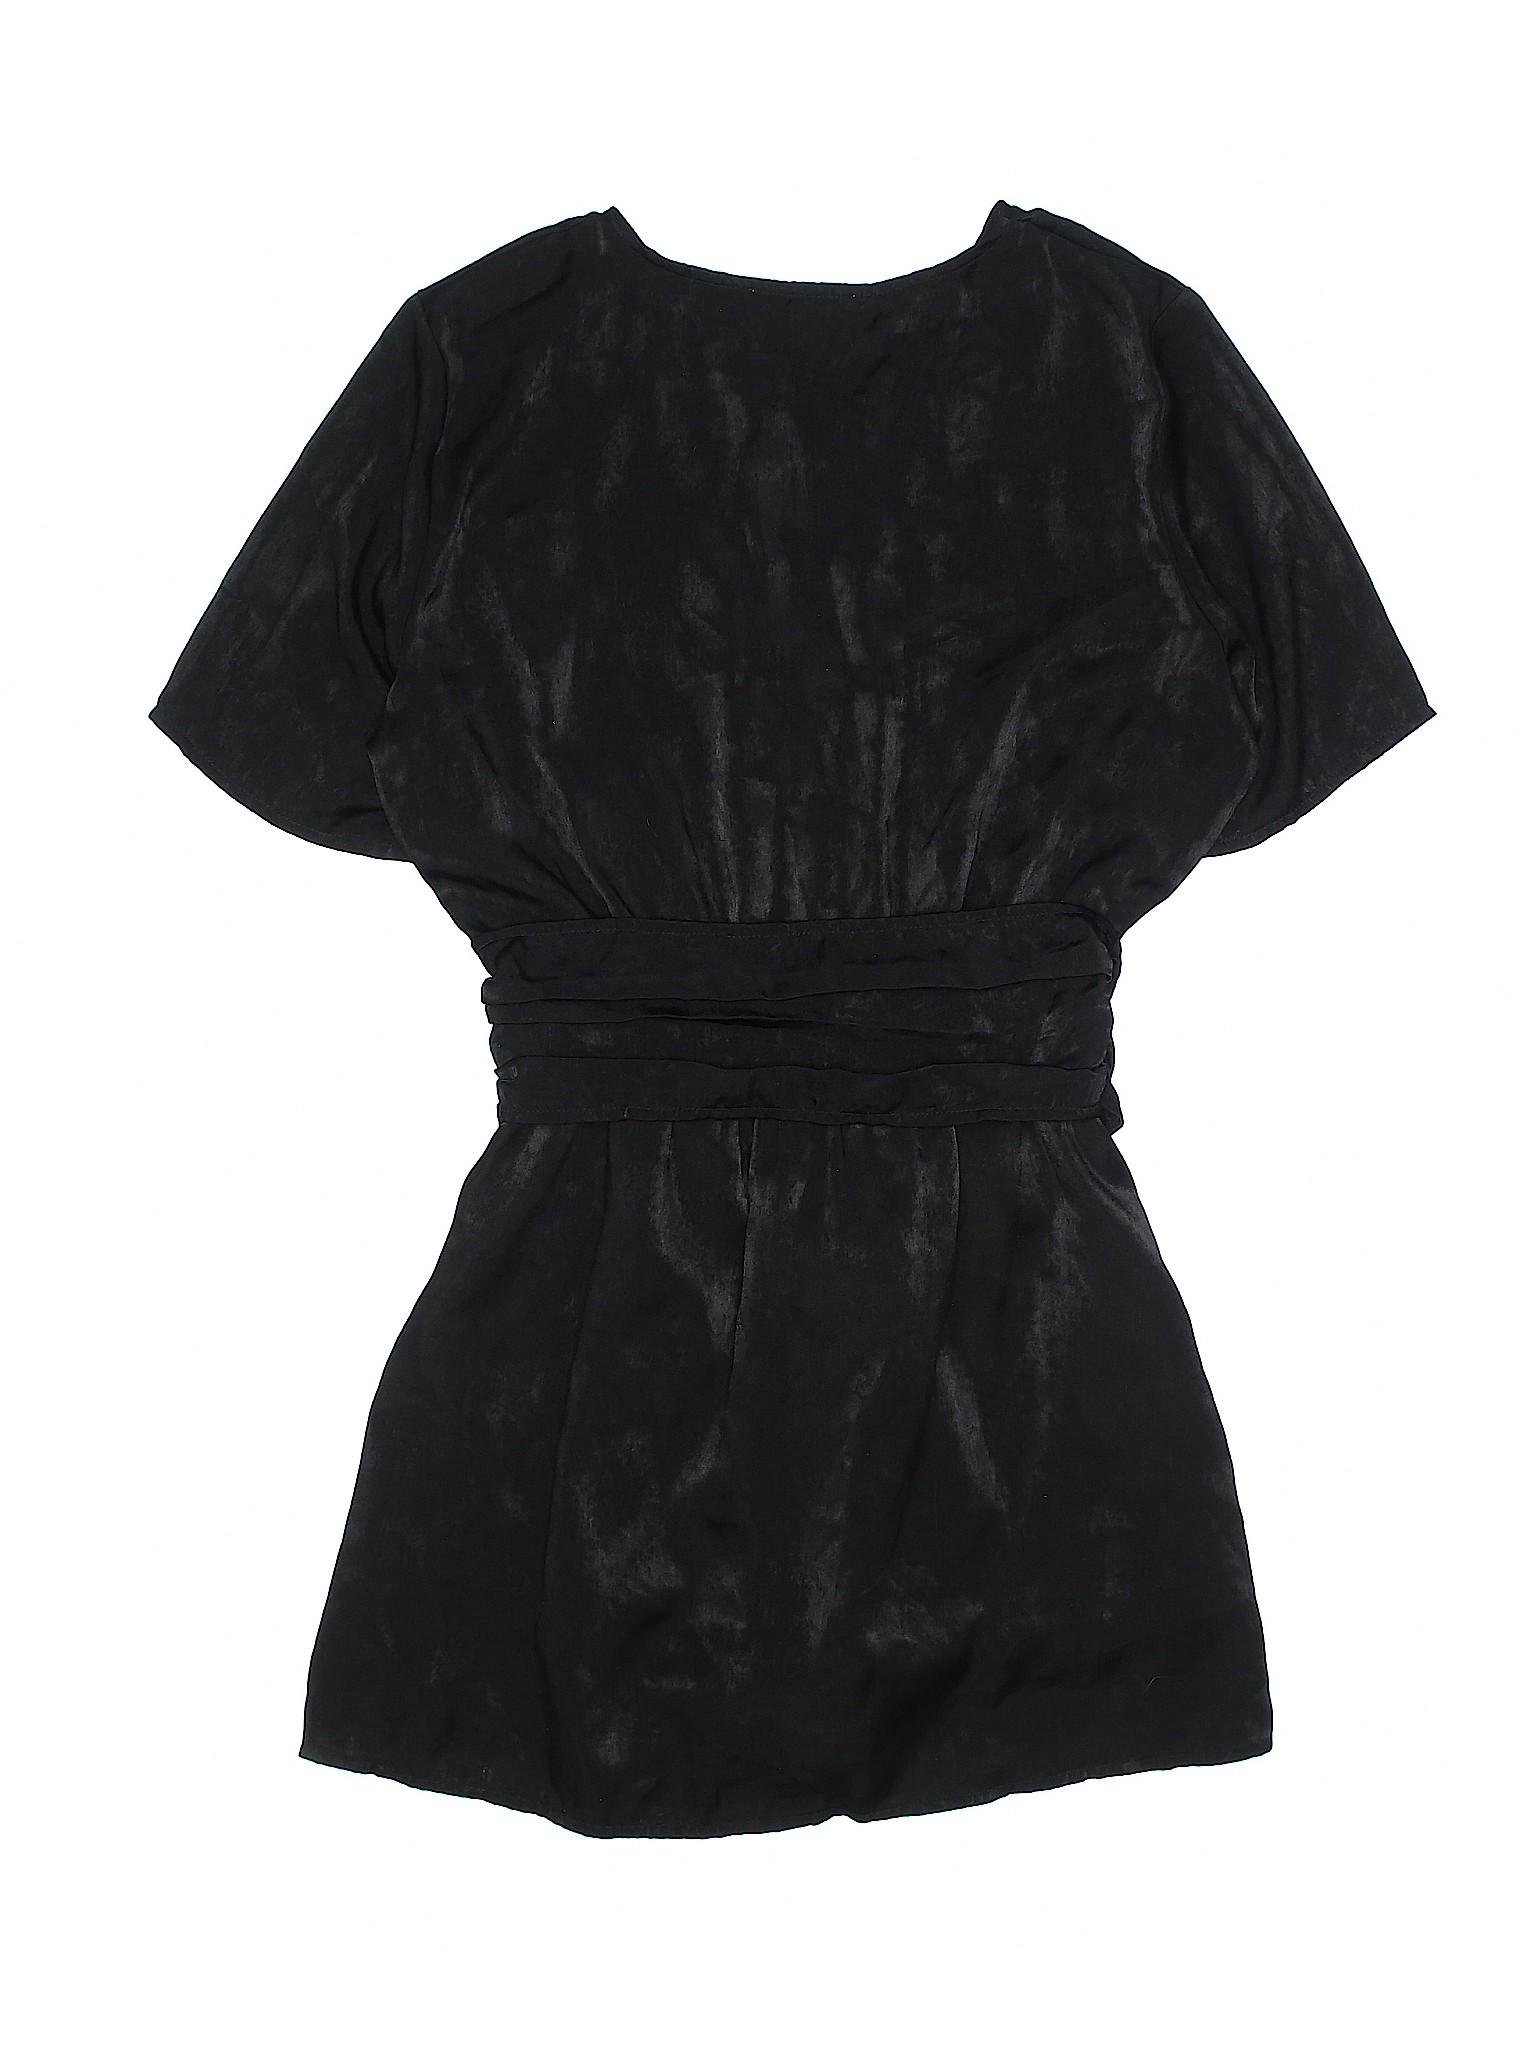 Skirt winter Sabo Romper Boutique winter Boutique 4zRqcwngB